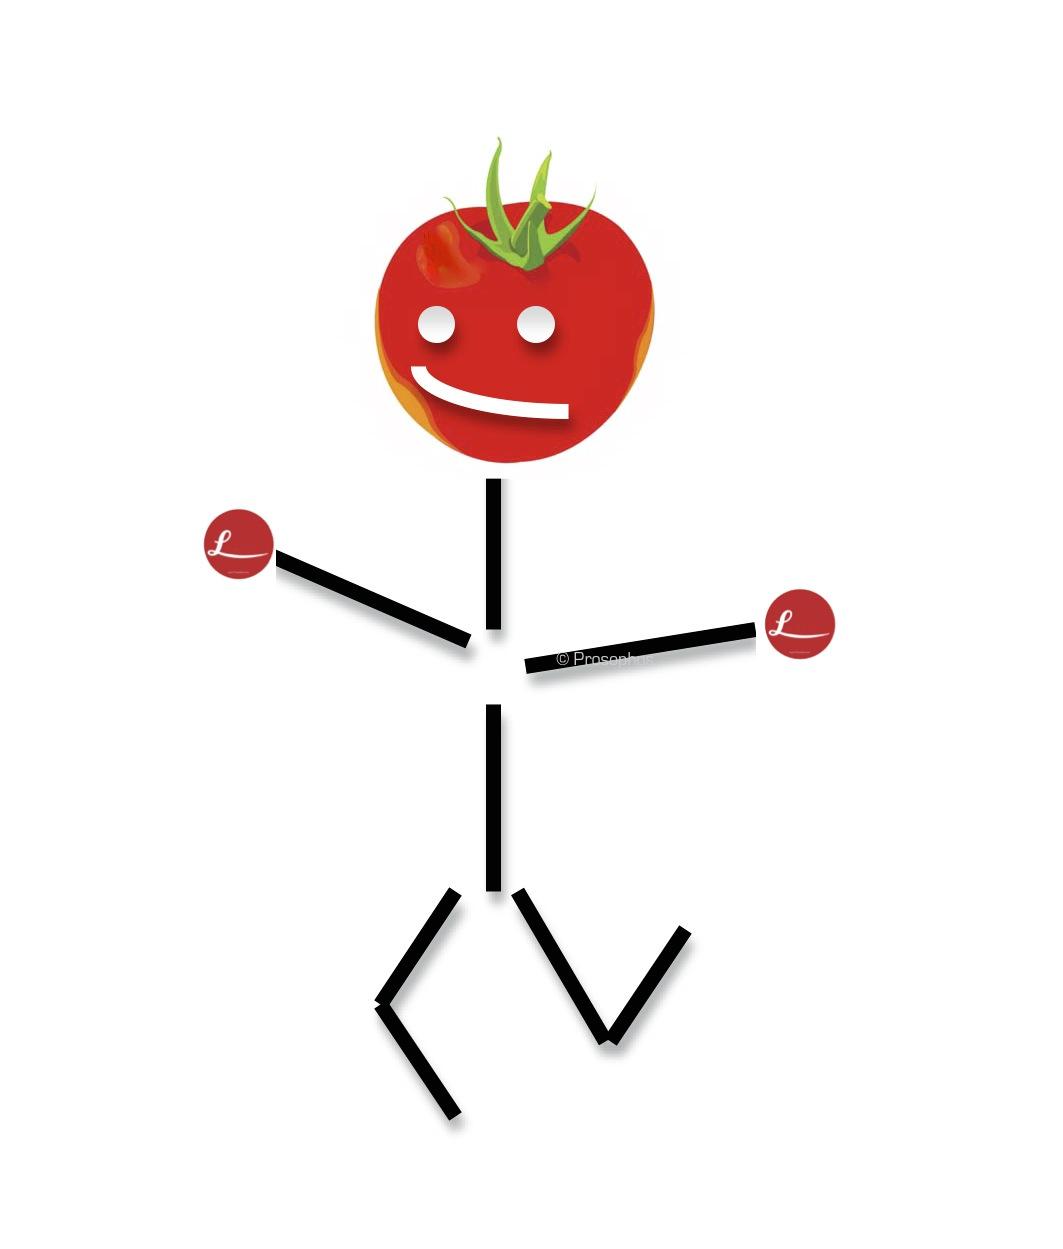 Prosophos - Tomato Face